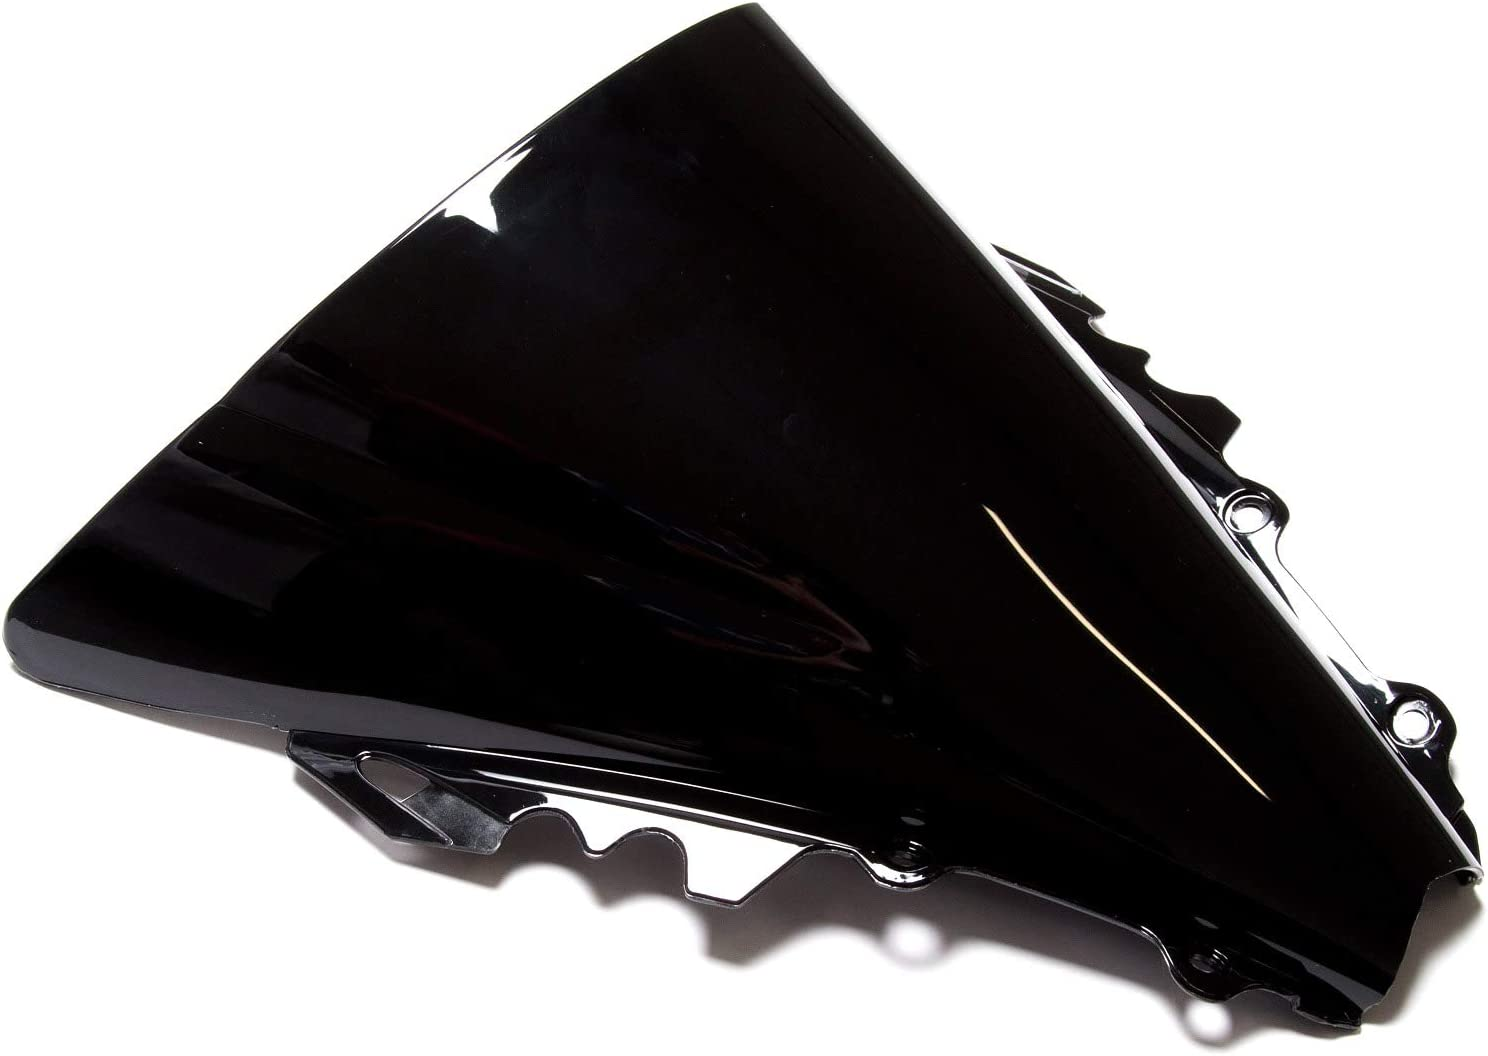 MPW Double Bubble Black Windshield Screen Yamaha YZF-R6 06-07